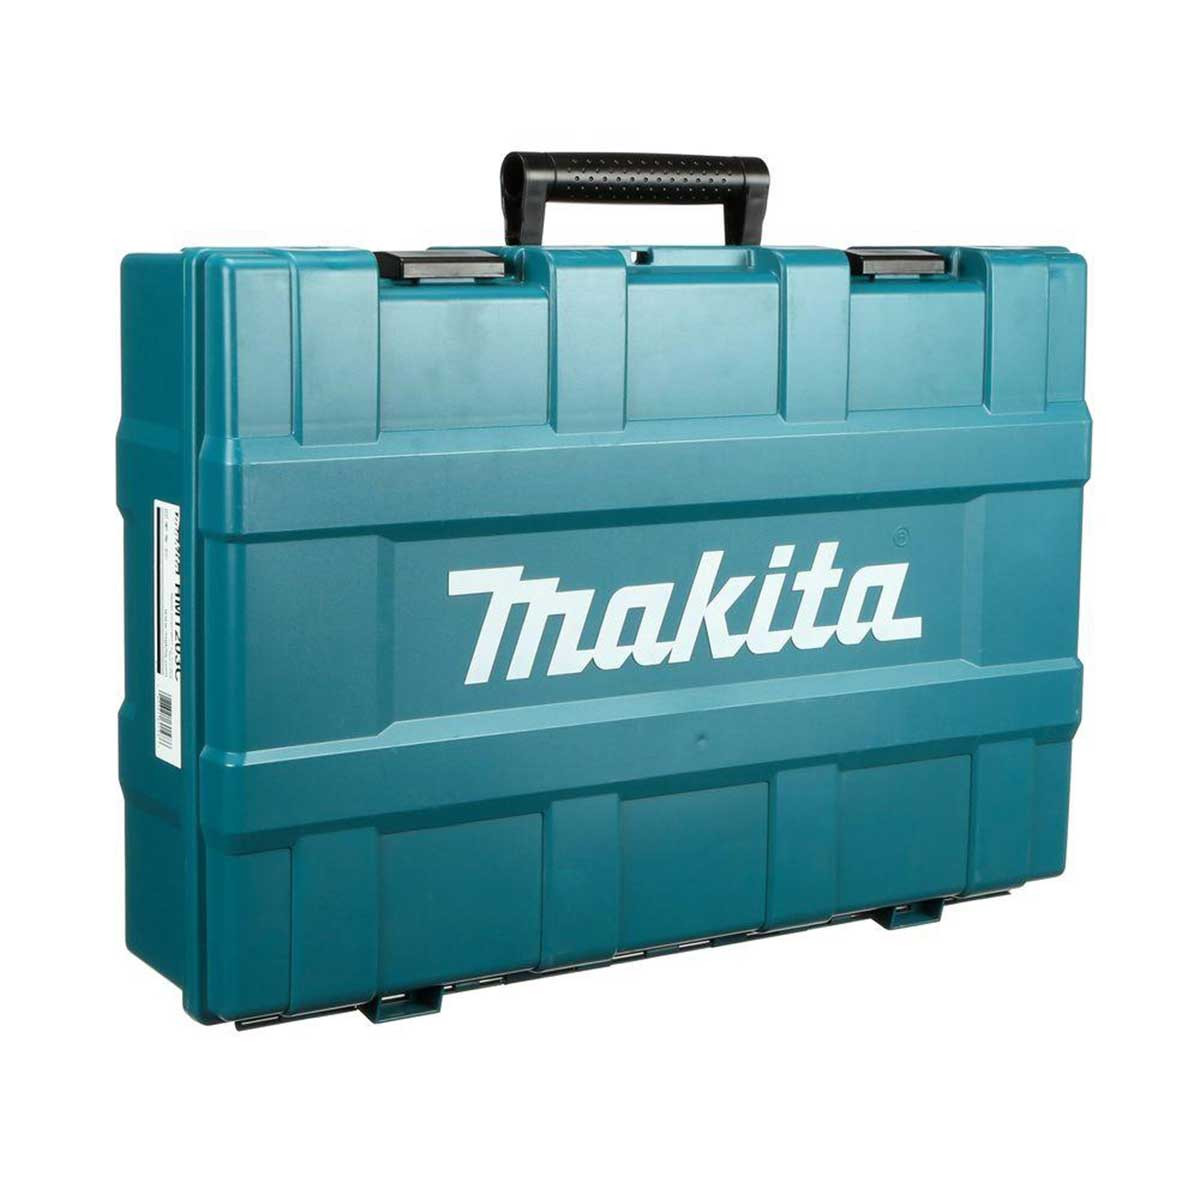 HM1203C Makita Demo Hammer case